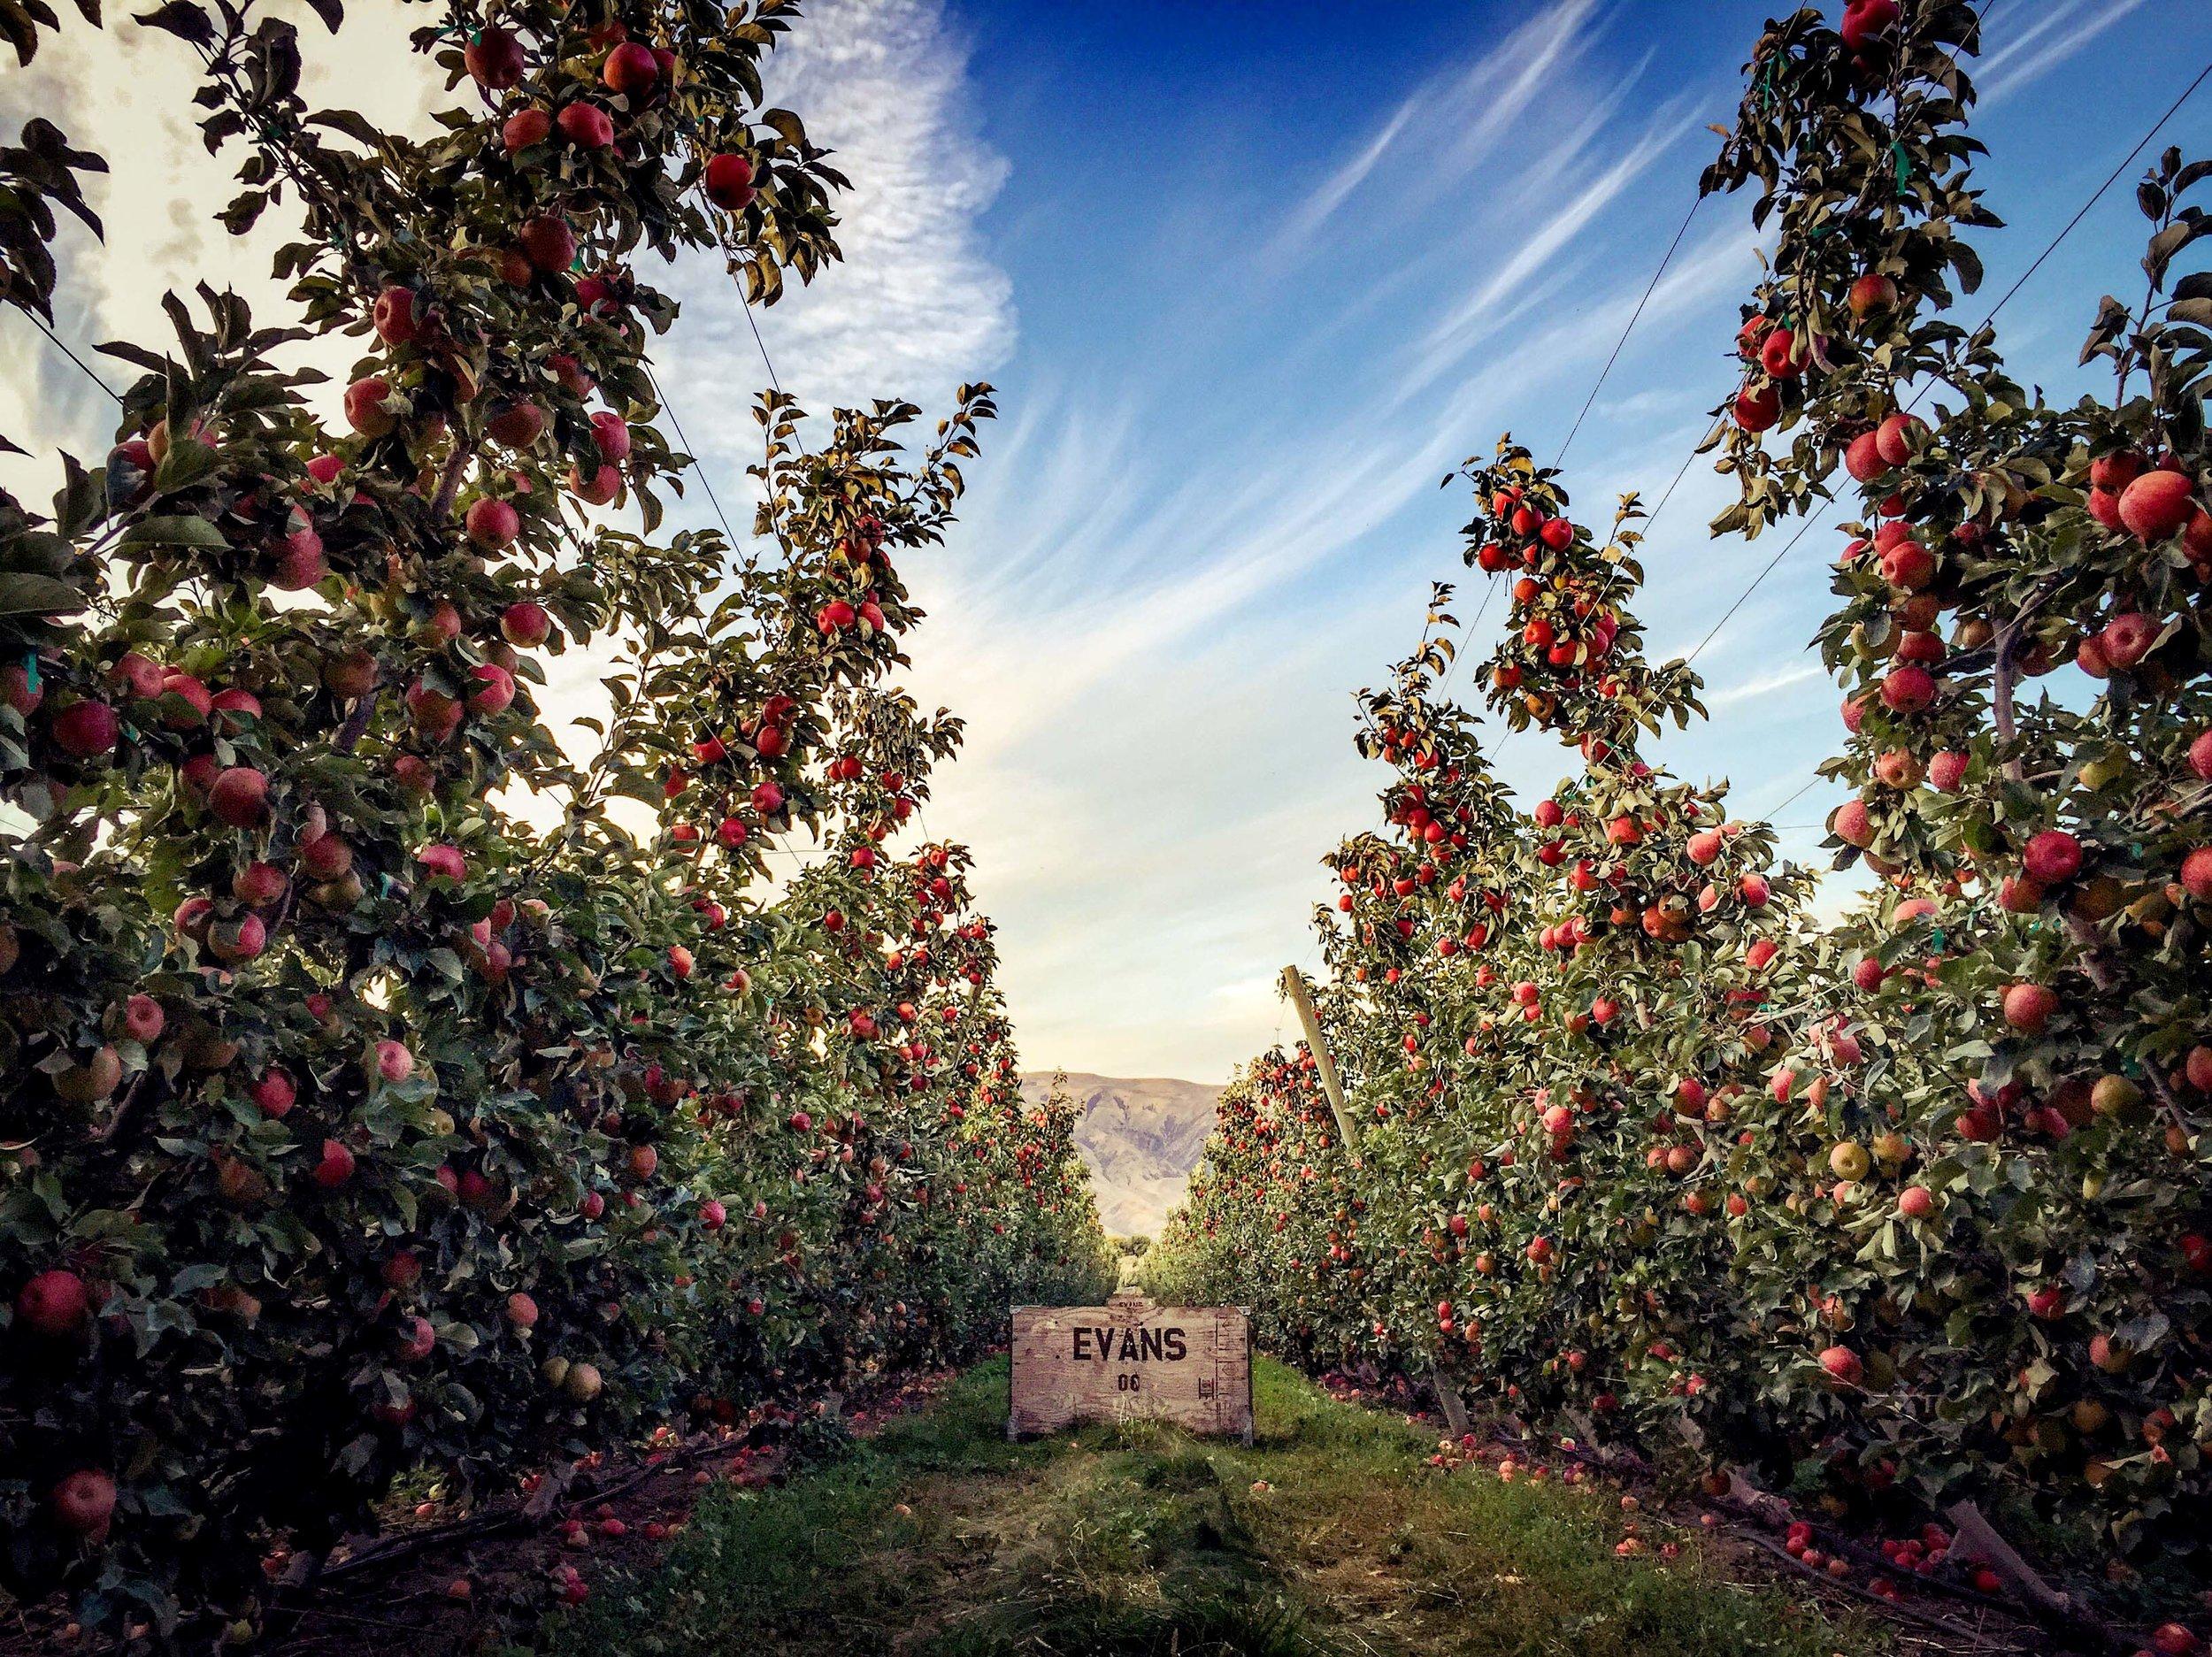 Evans Fruit Bin in Orchard.jpg